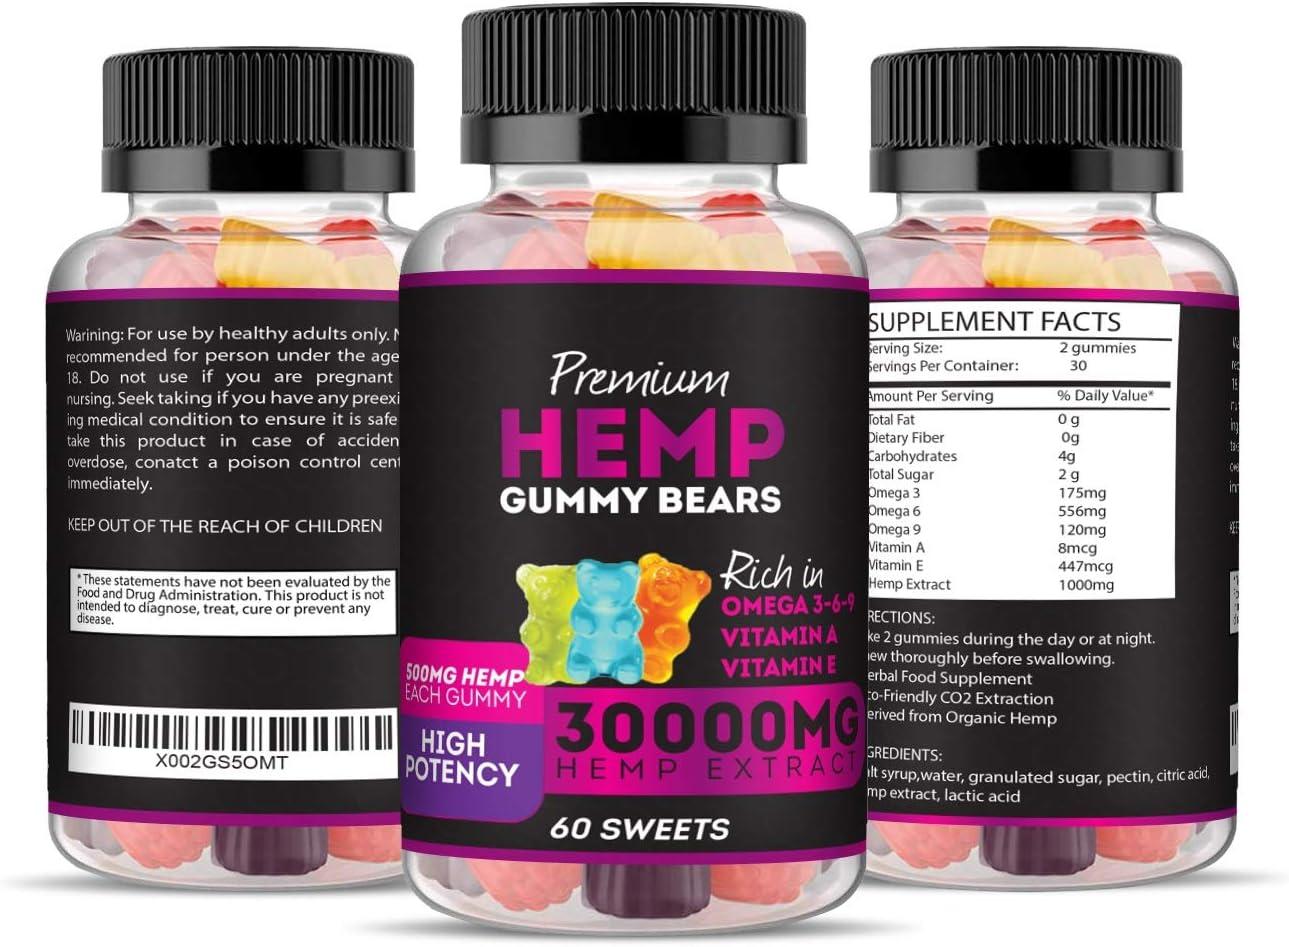 Hemp Gummies Premium 30000 High Potency - Fruity Gummy Bear with Hemp Oil - Natural Hemp Candy Supplements Pain Anxiety Stress & Inflammation Relief - Promotes Sleep and Calm Mood